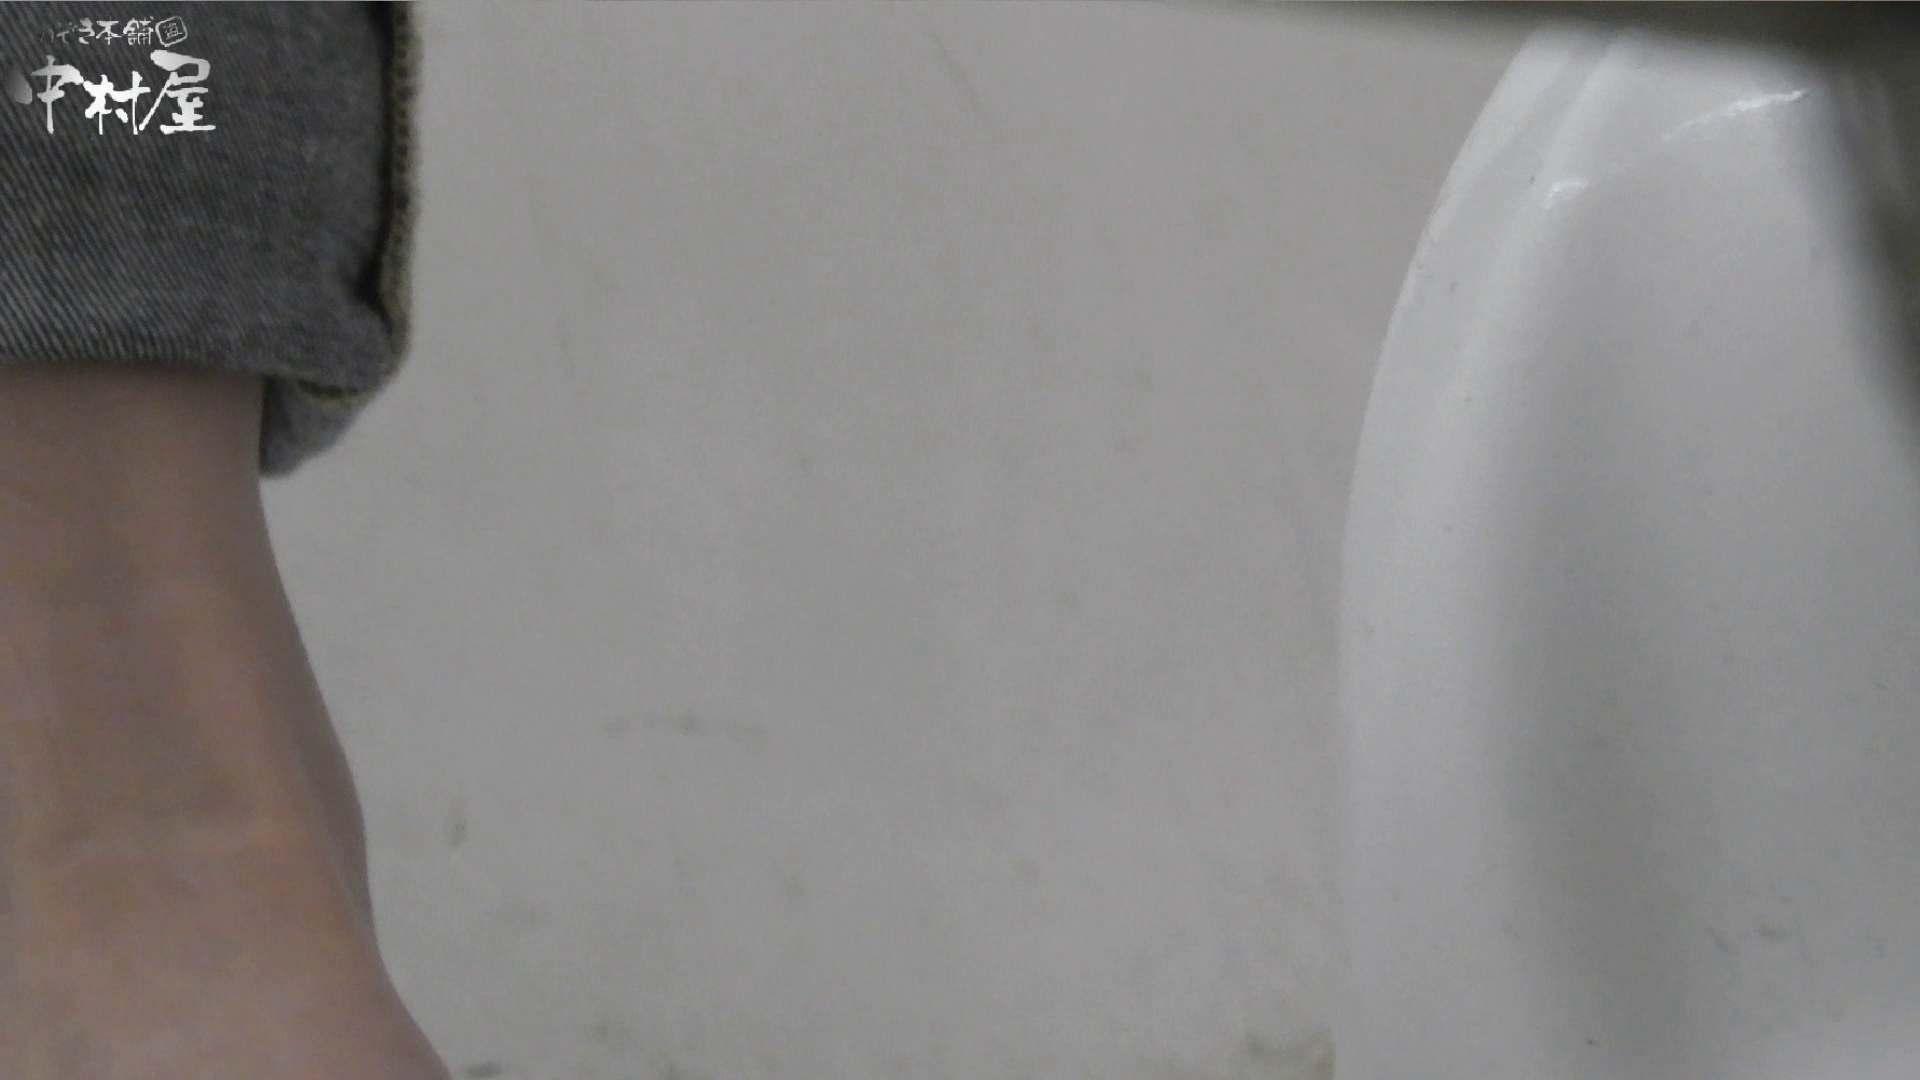 vol.42 命がけ潜伏洗面所! カカト上げながら・硬度強(太)・180g OLセックス   潜入  102画像 89